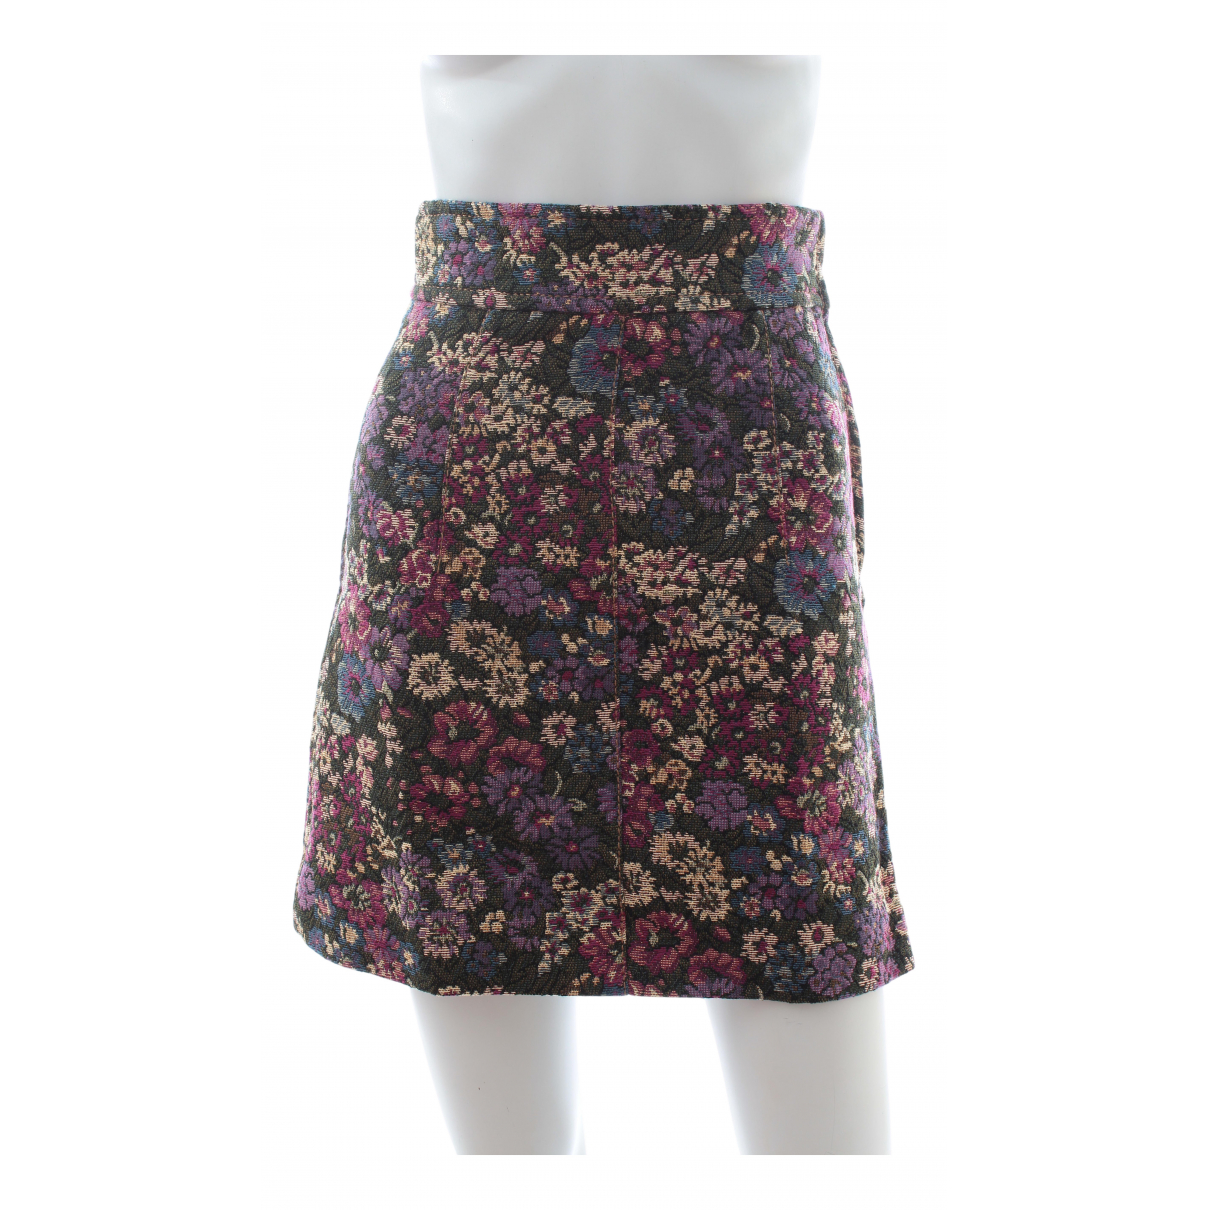 Miu Miu N Multicolour skirt for Women 38 IT